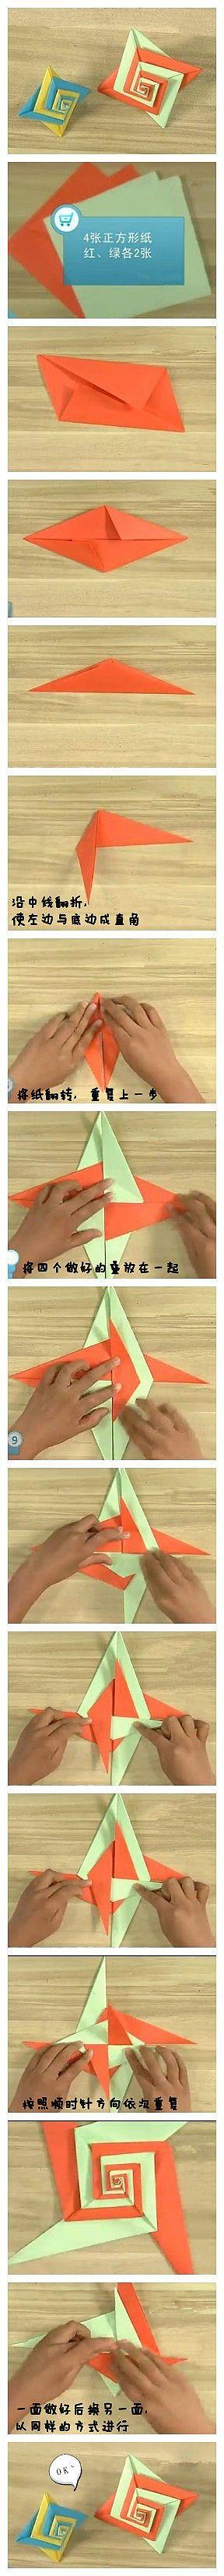 origami spiral.